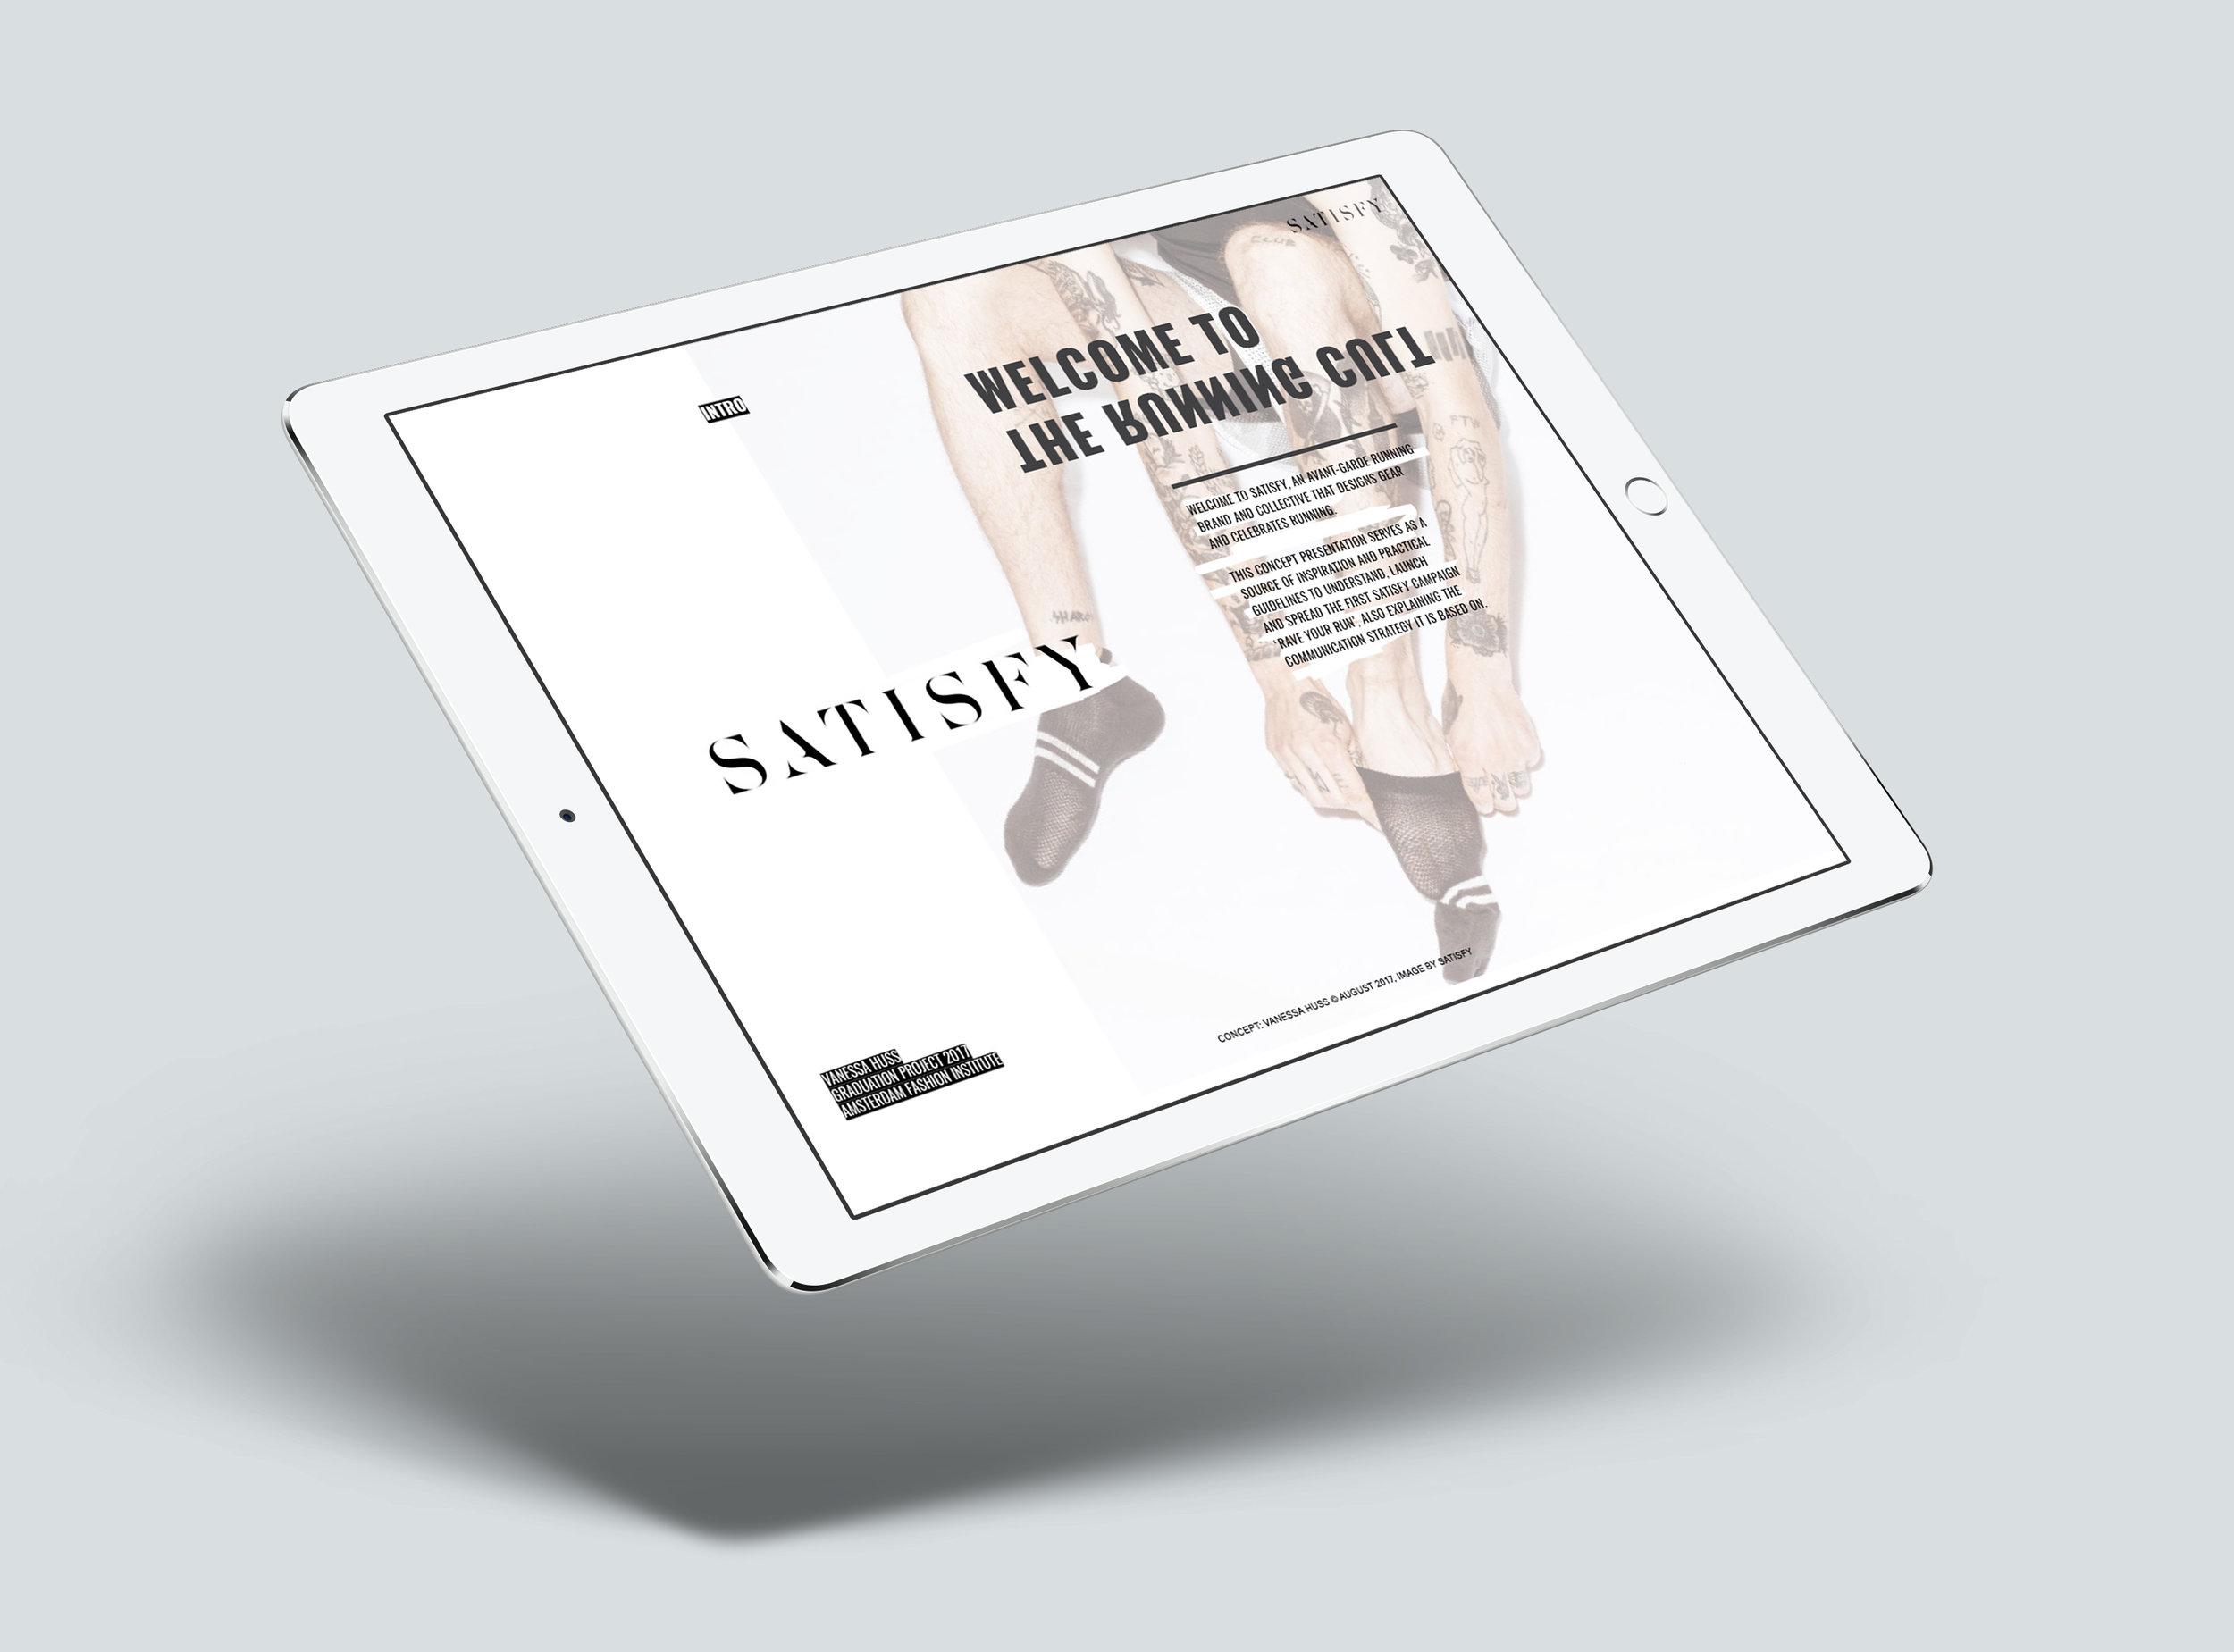 SATISFY_strategy_intro.jpg